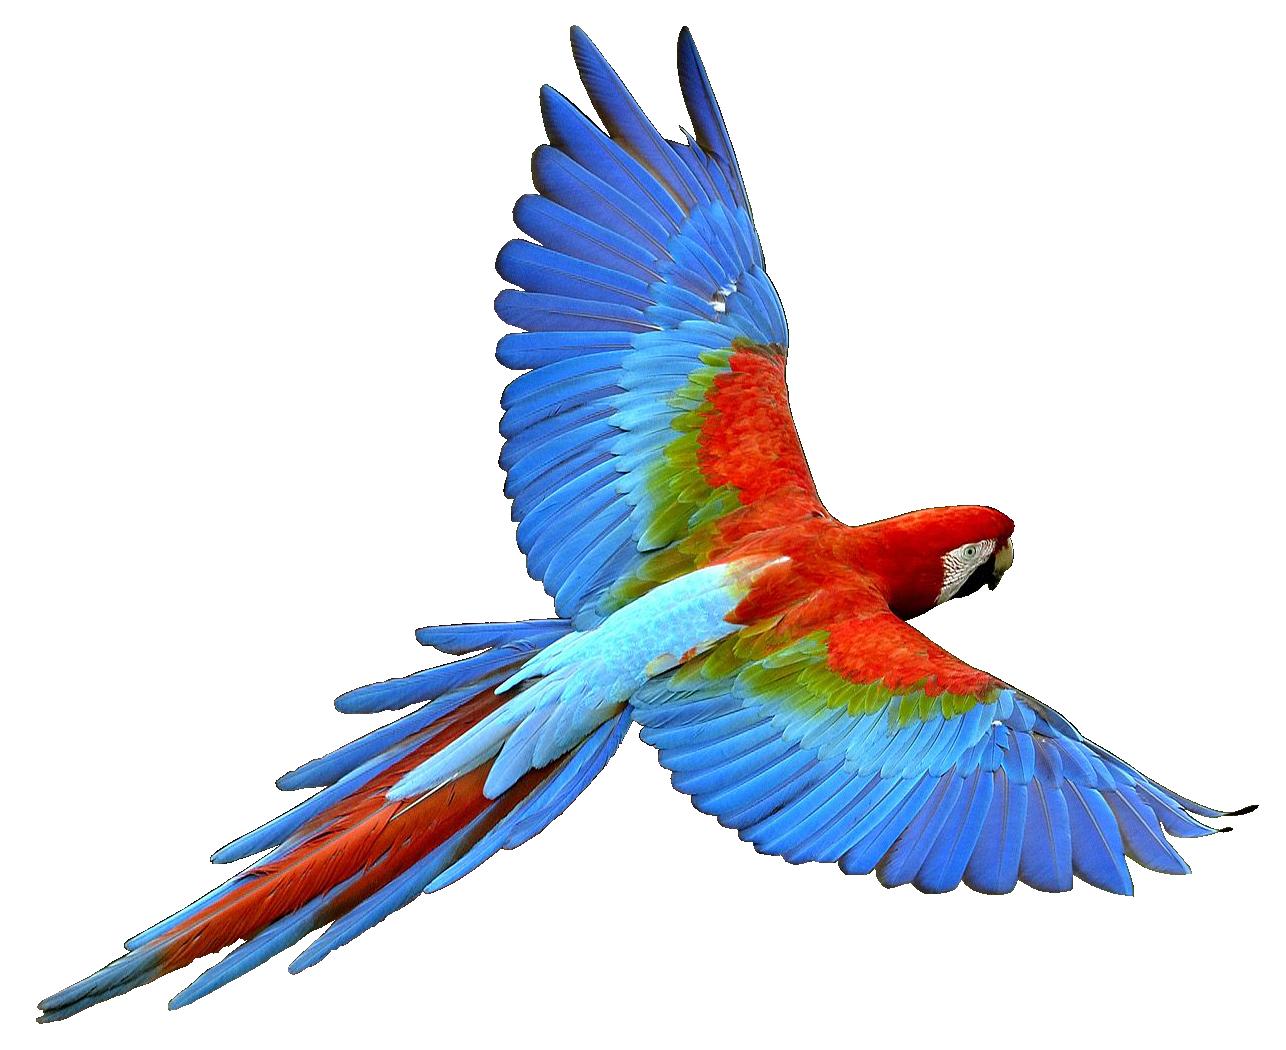 1286x1050 Parrot Transparent Image Parrot Animal